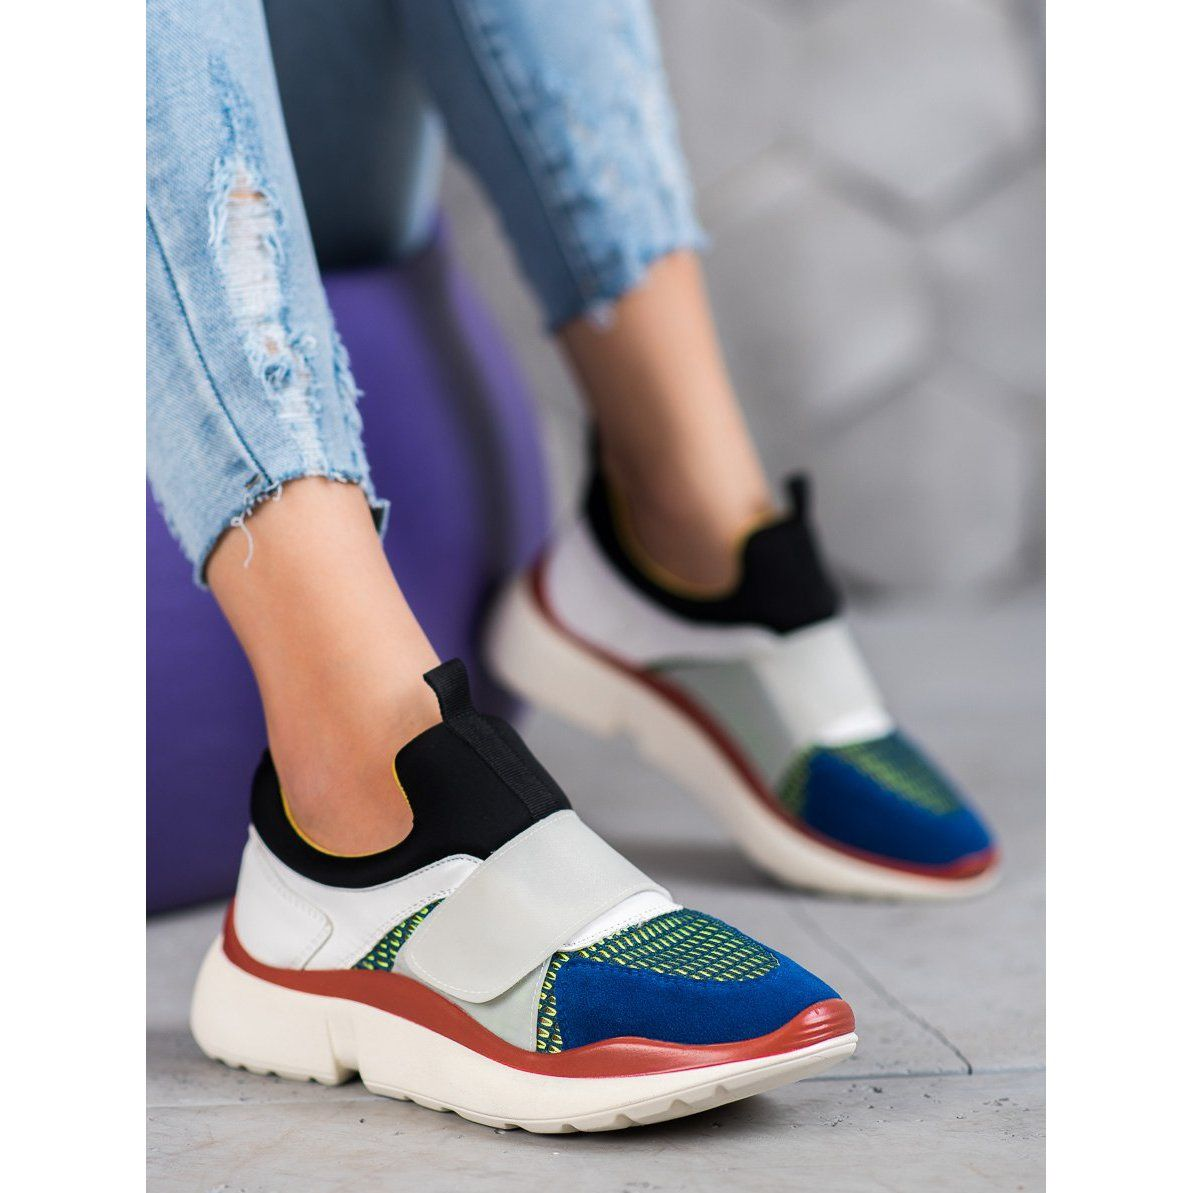 Sweet Shoes Lekkie Buty Sportowe Na Rzep Wielokolorowe Shoes Slip On Sneaker Sneakers